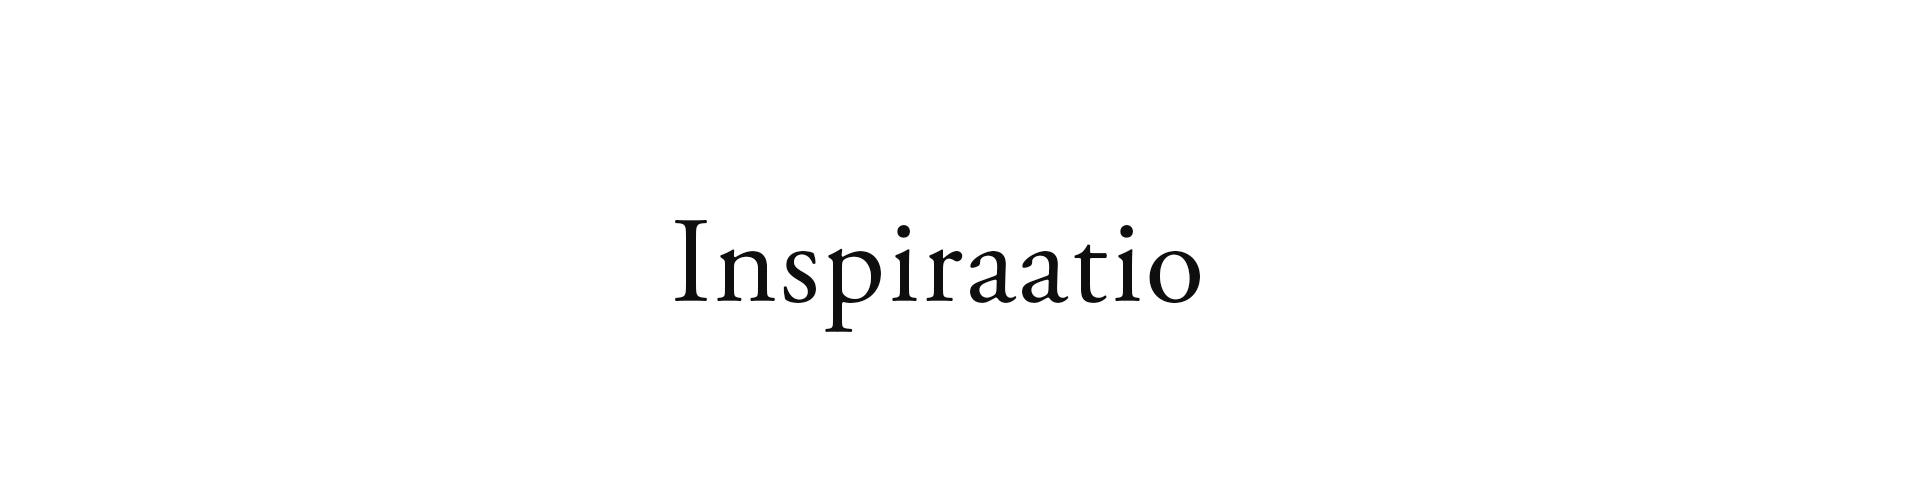 Inspiraatio